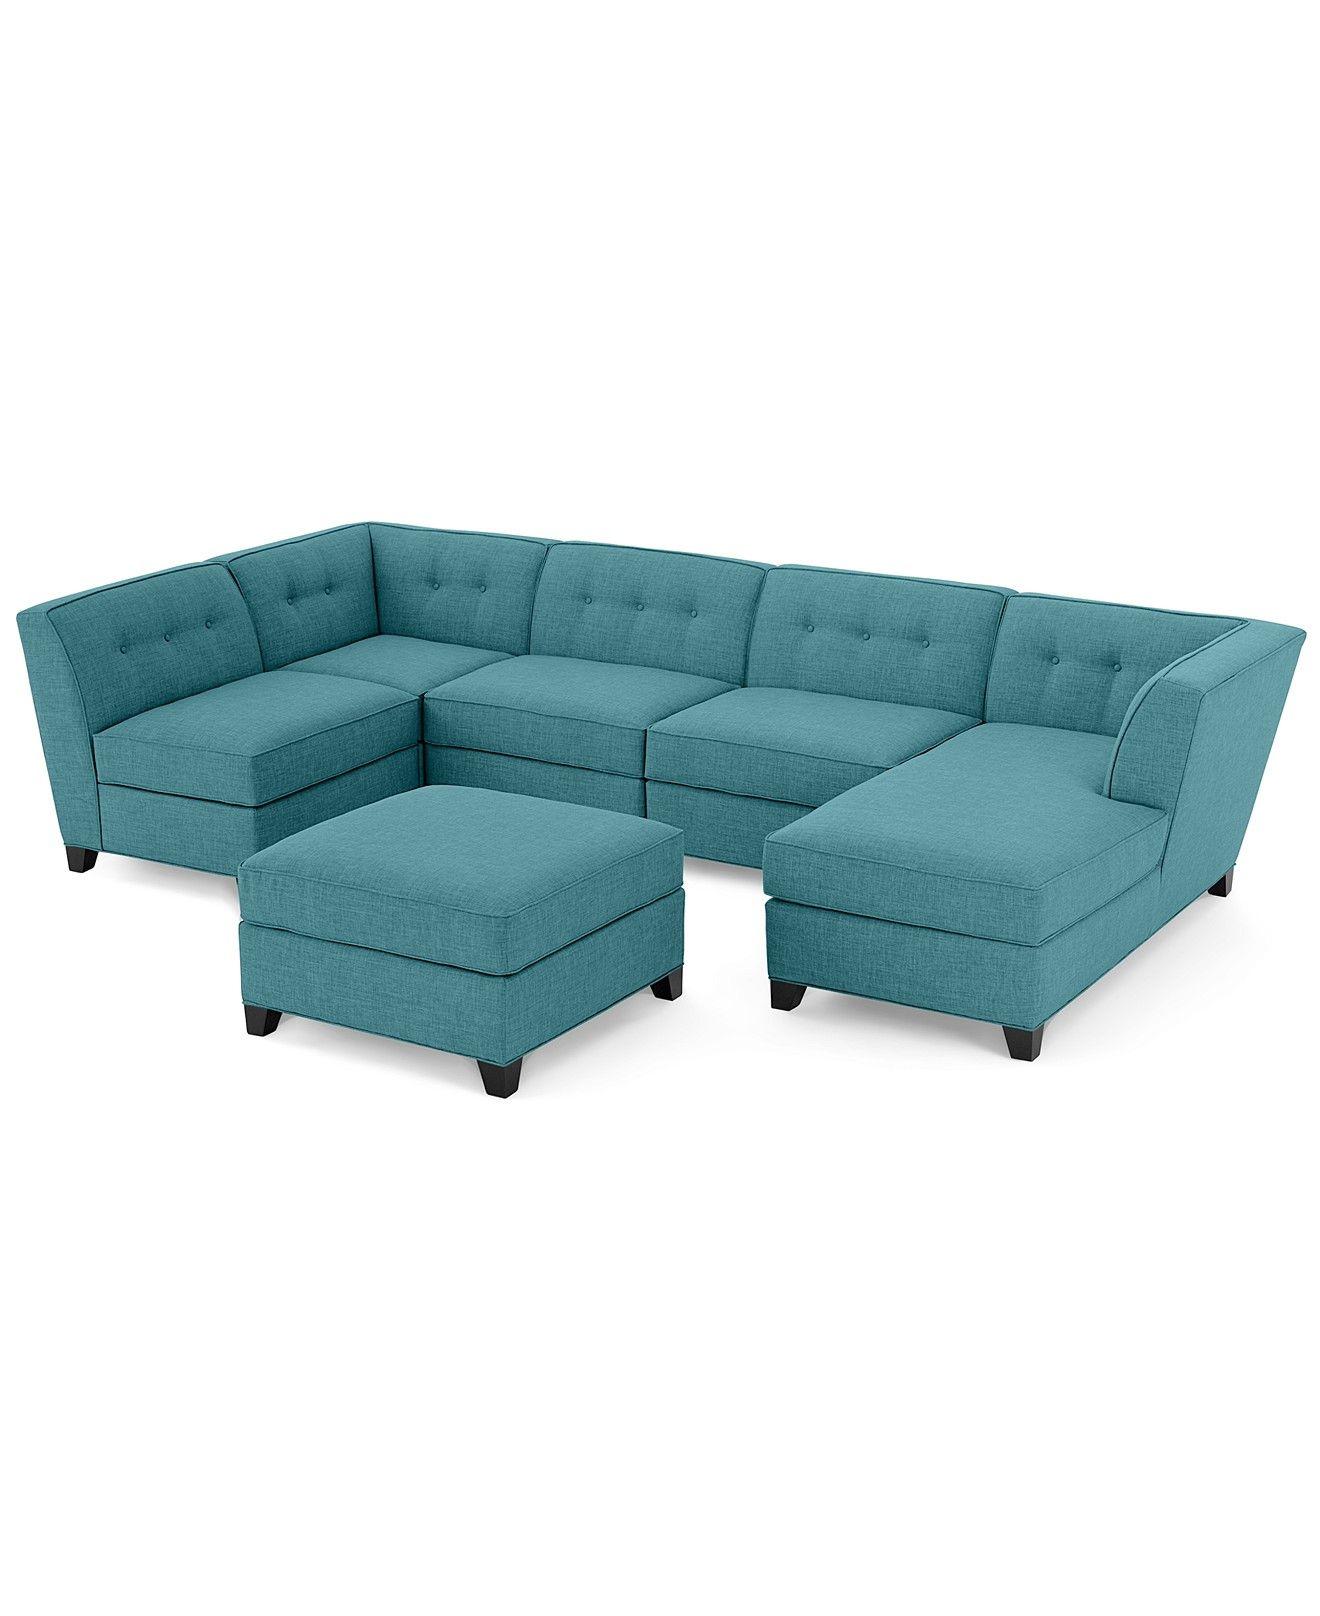 6 piece modular sectional sofa nice sofas for cheap elegant